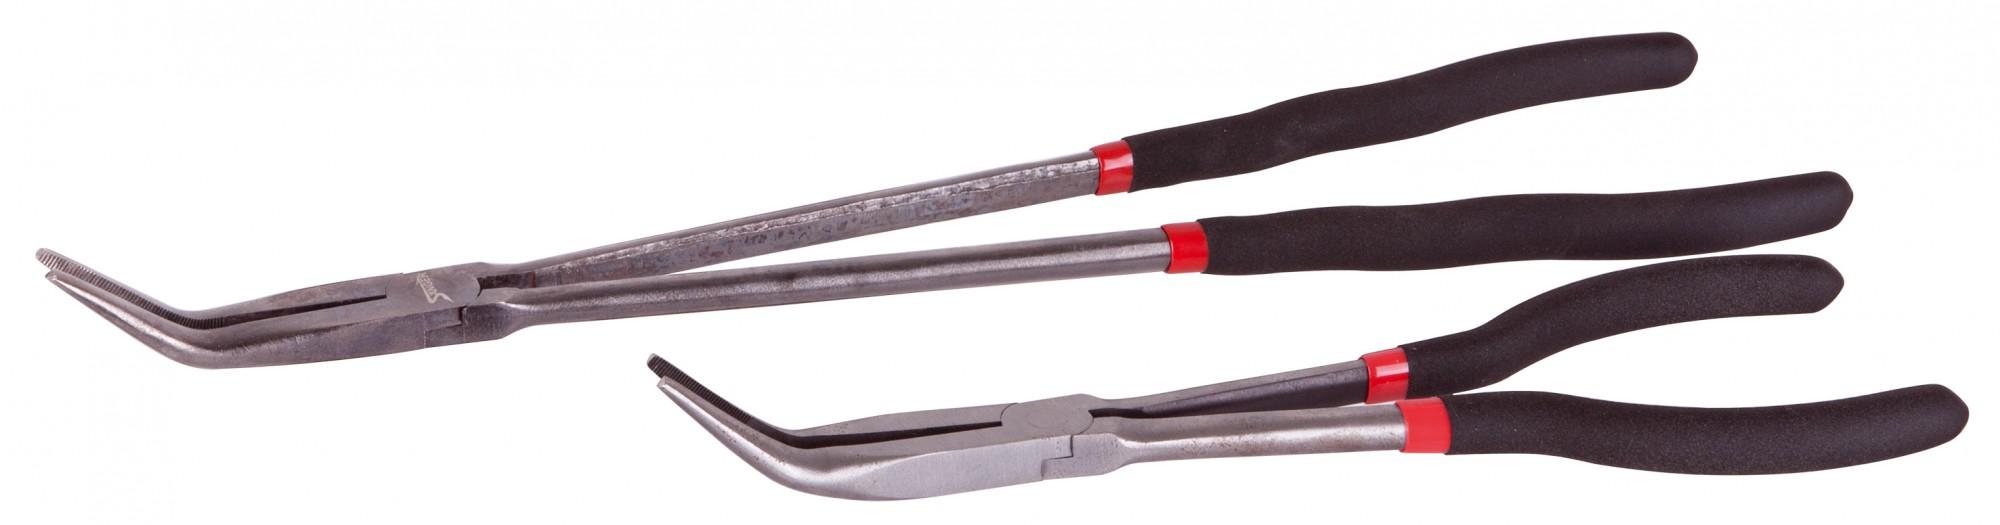 uni-cat-41cm-tool-no-1-zange-crimper